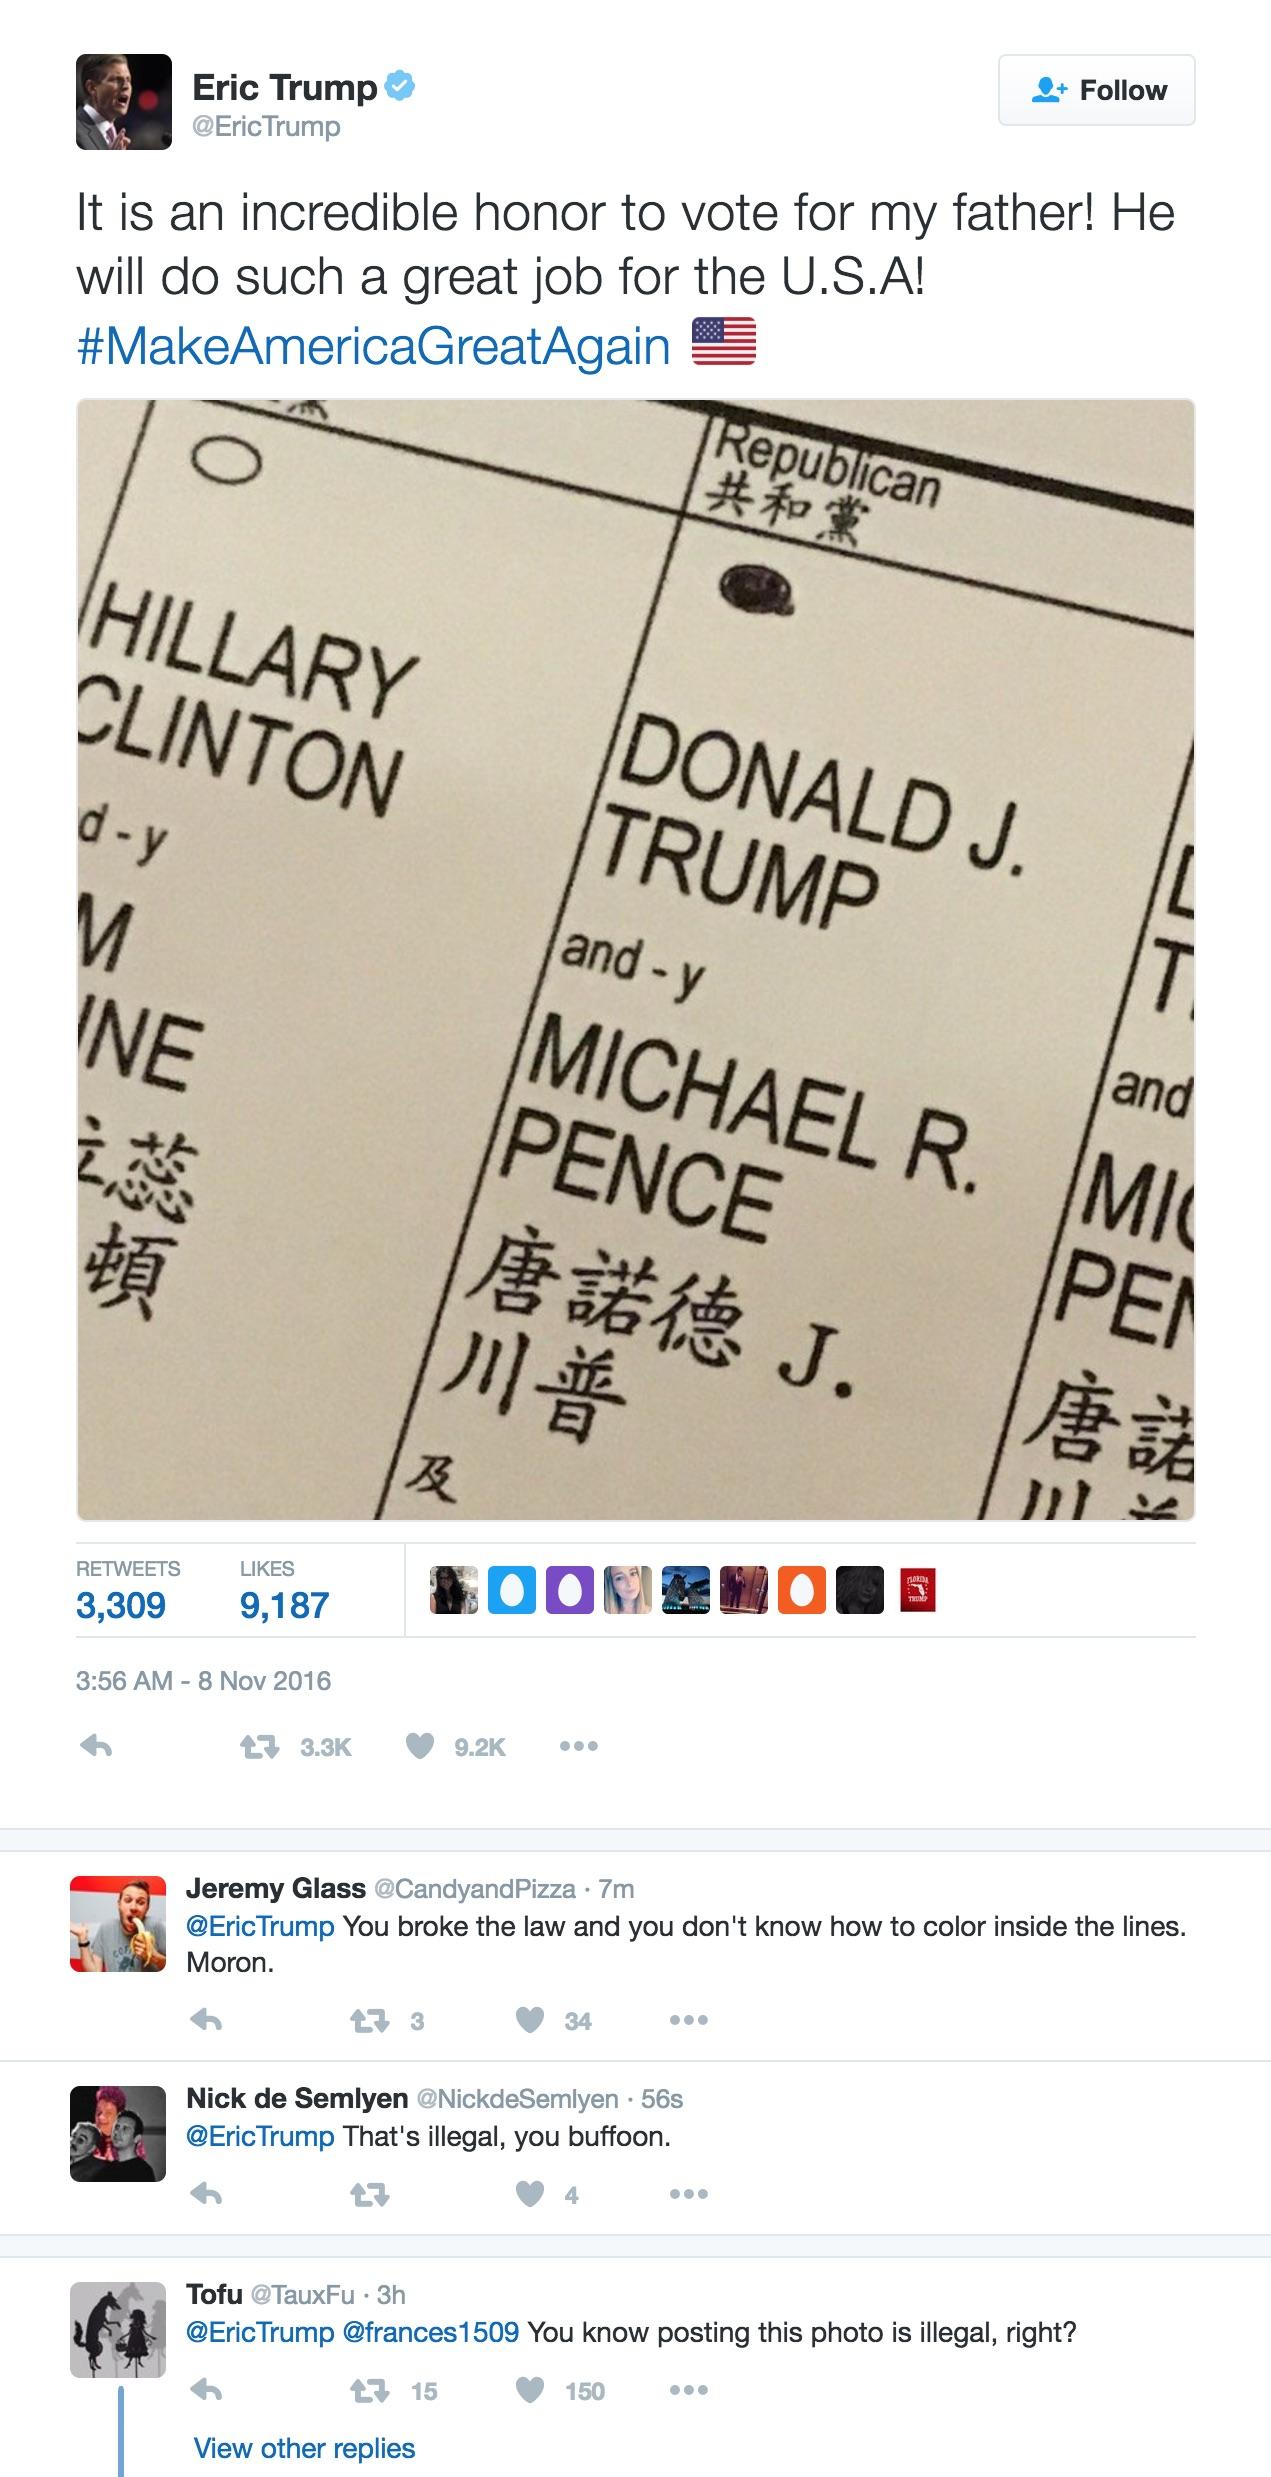 eric-trump-ballot-selfie-tweet